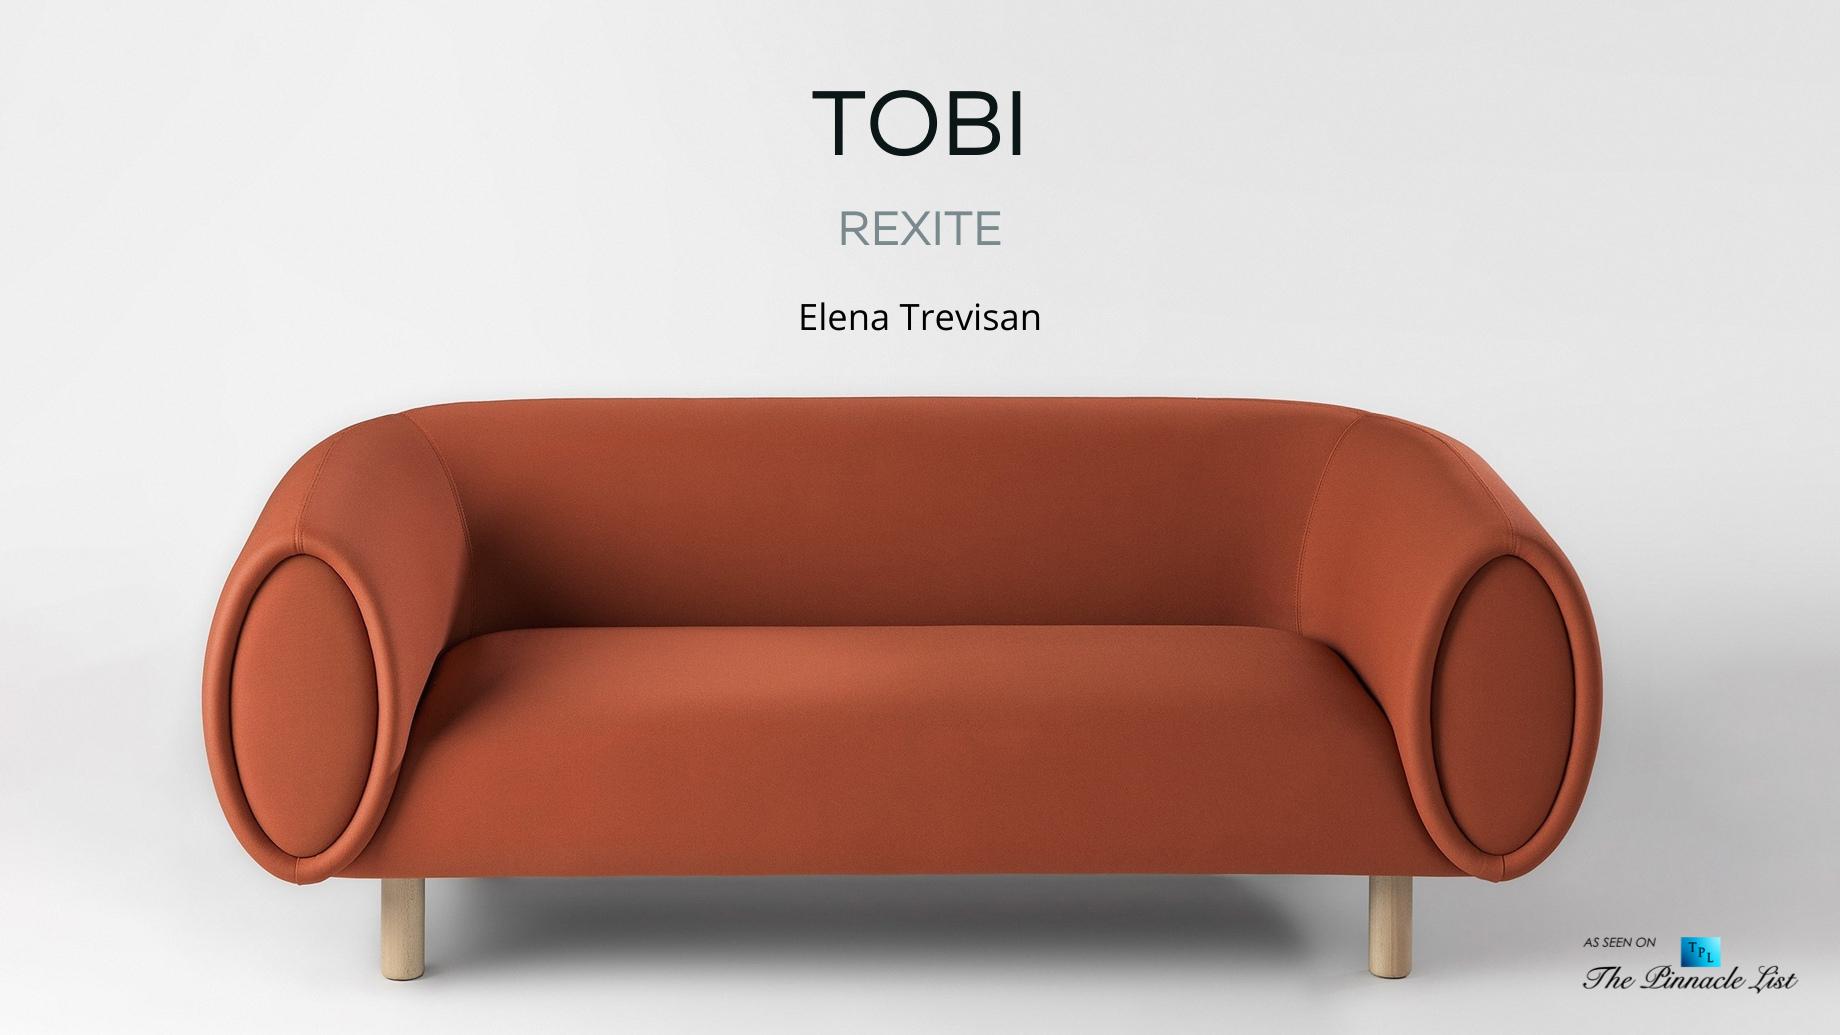 Iconic Tobi Sofa Designed with Zen Garden Principles by Rexite Italy